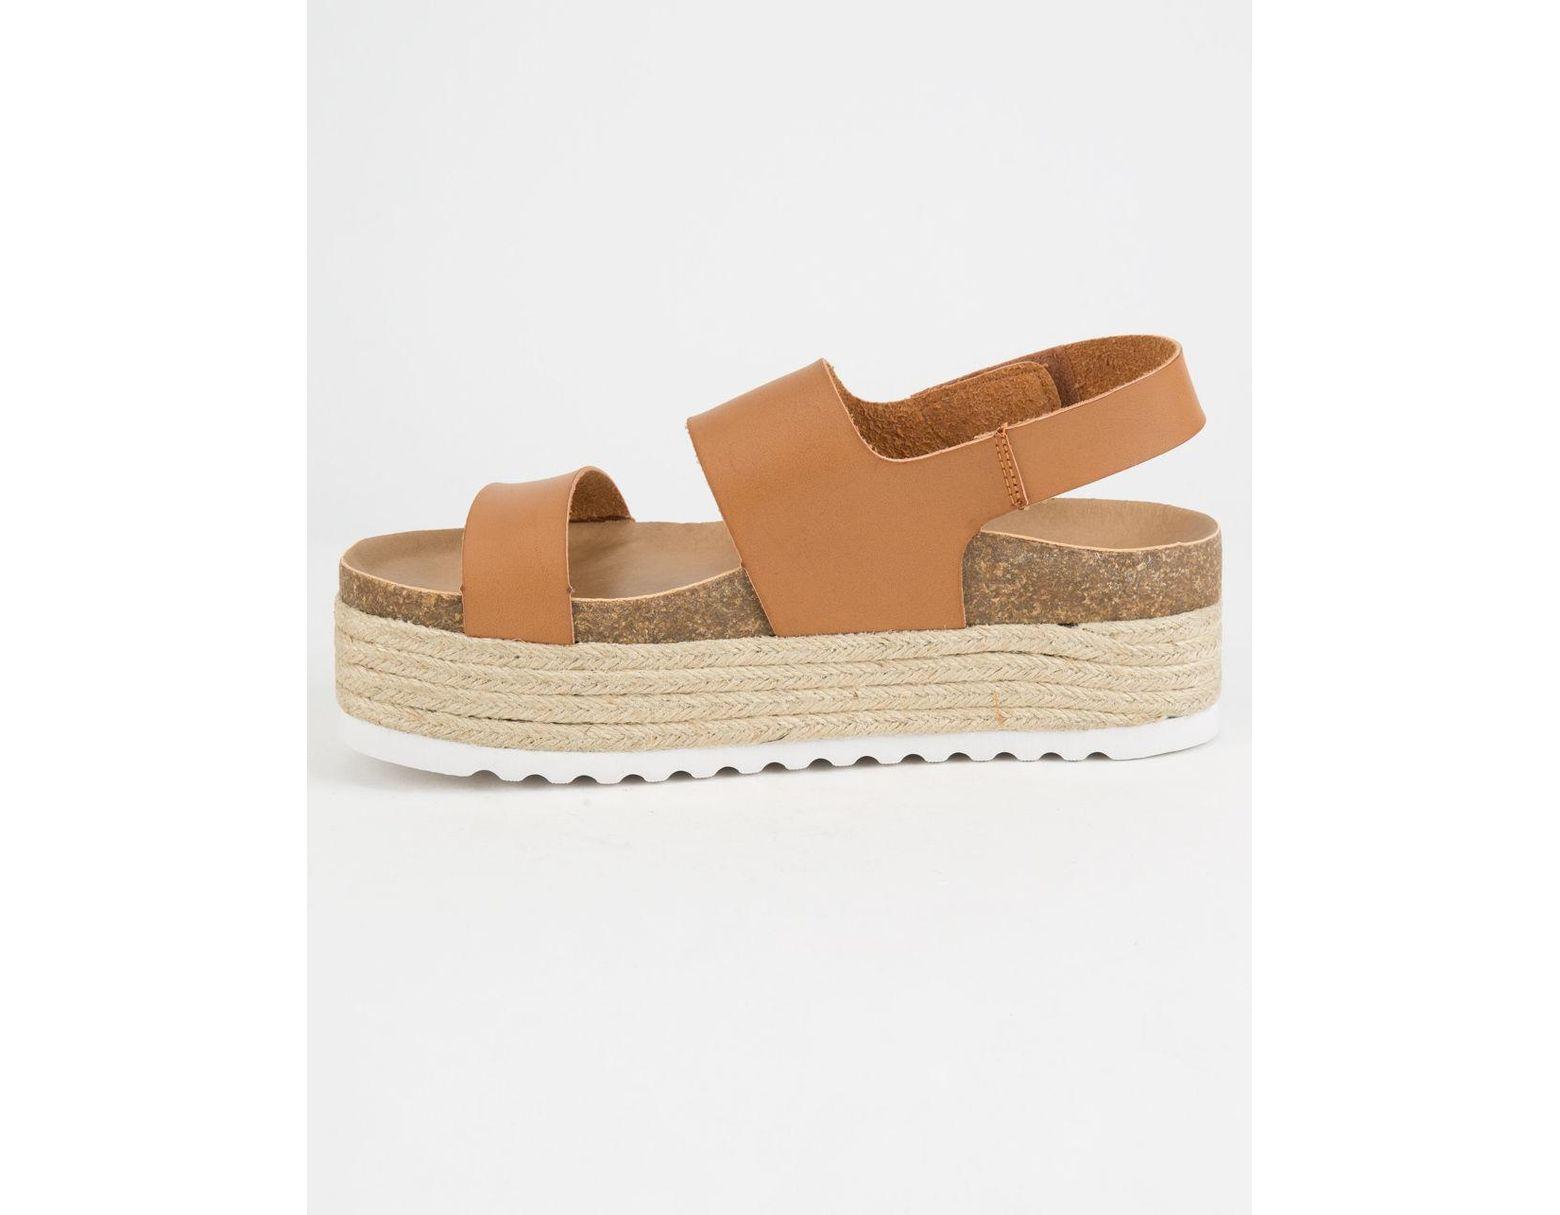 cda9bb6be Dirty Laundry Peyton Espadrille Cognac Womens Velcro Platform Sandals in  Brown - Save 61% - Lyst